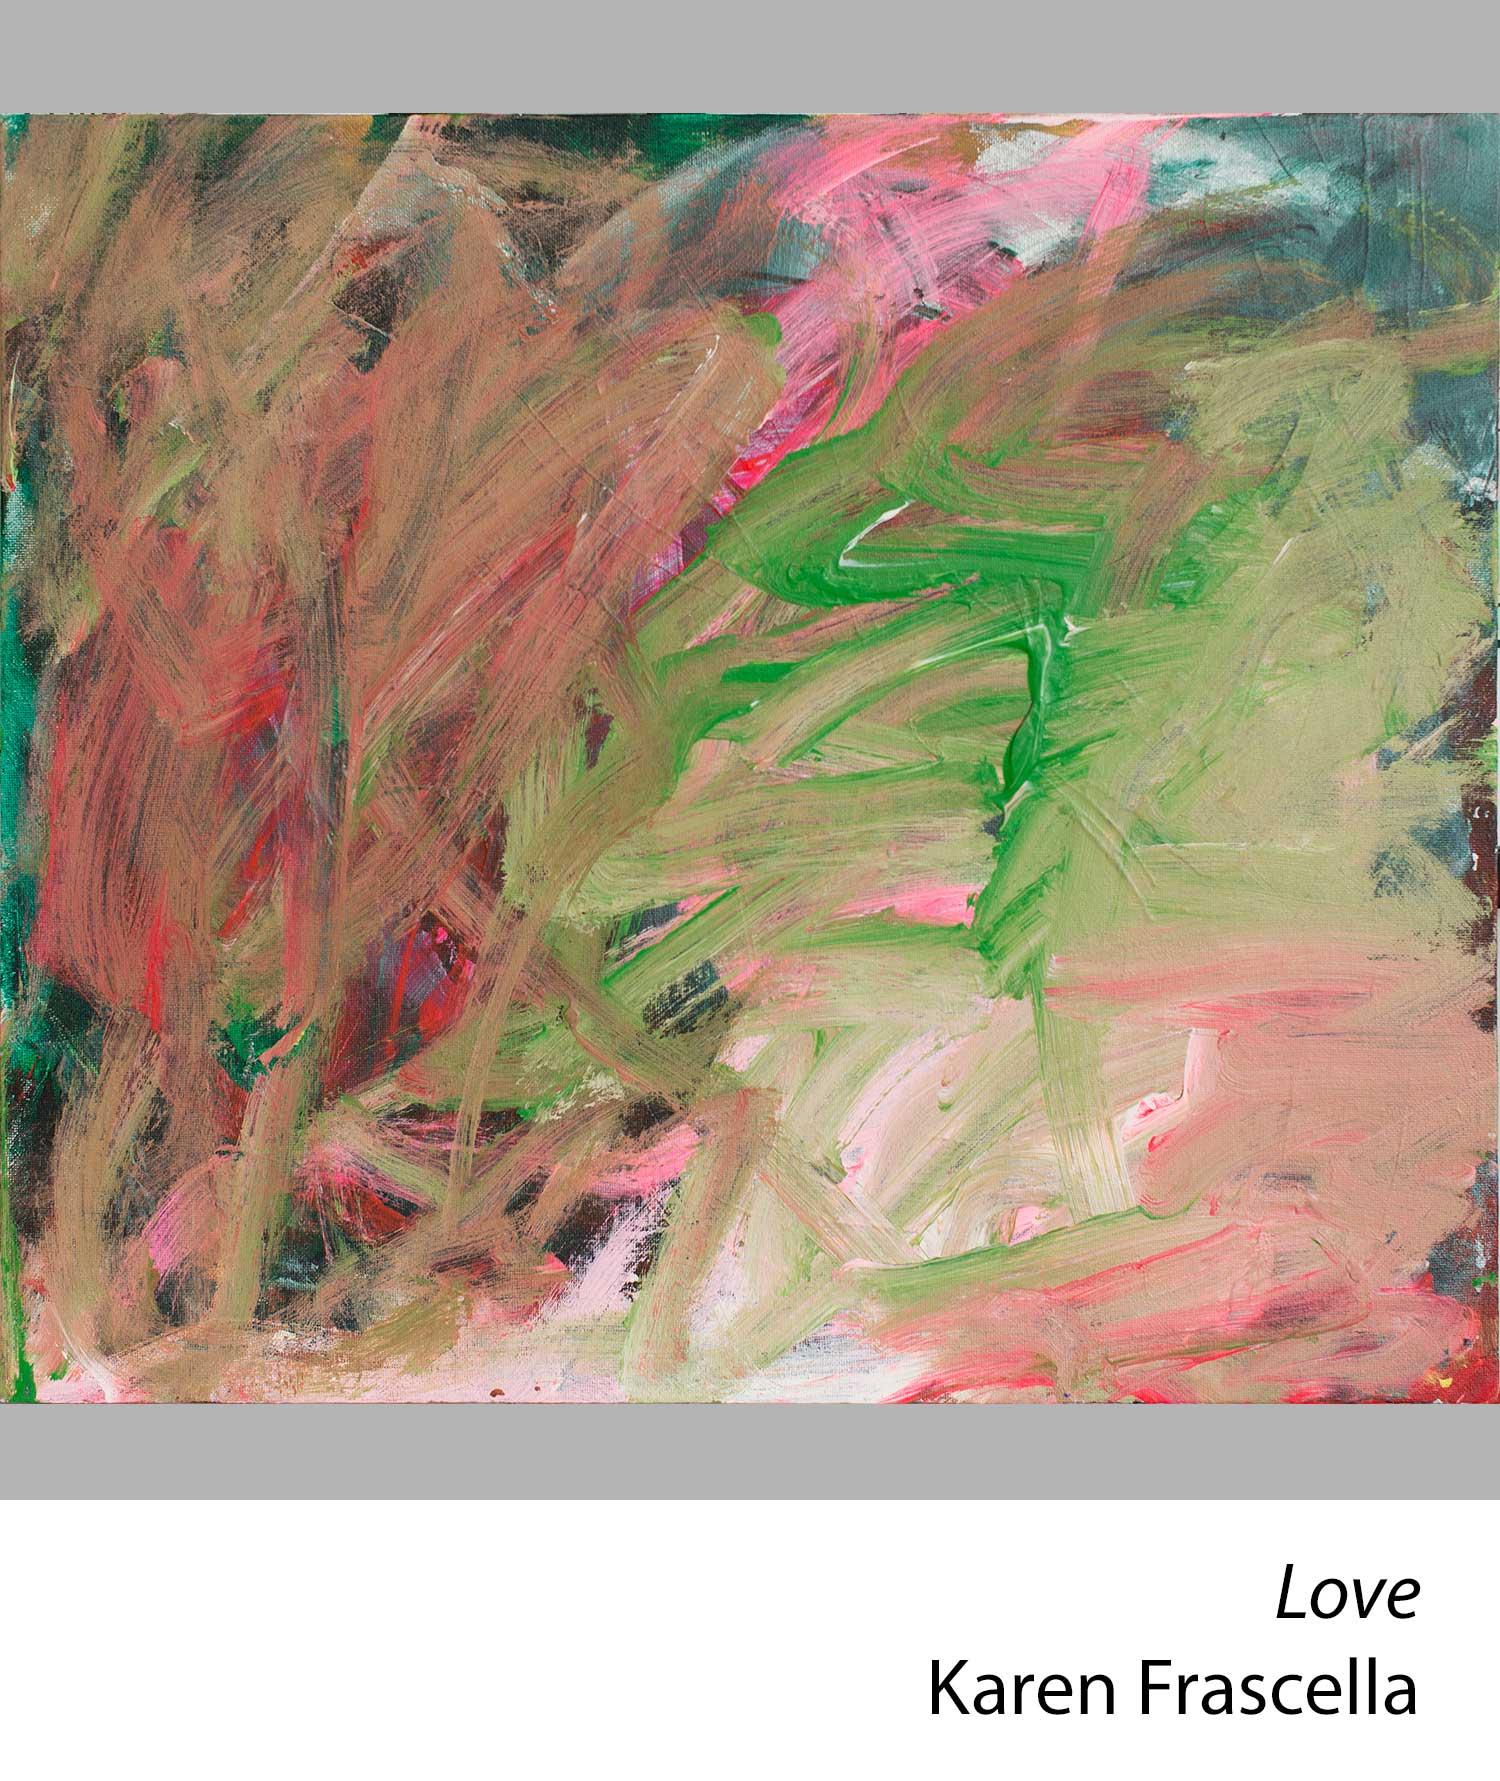 Love by Karen Frascella